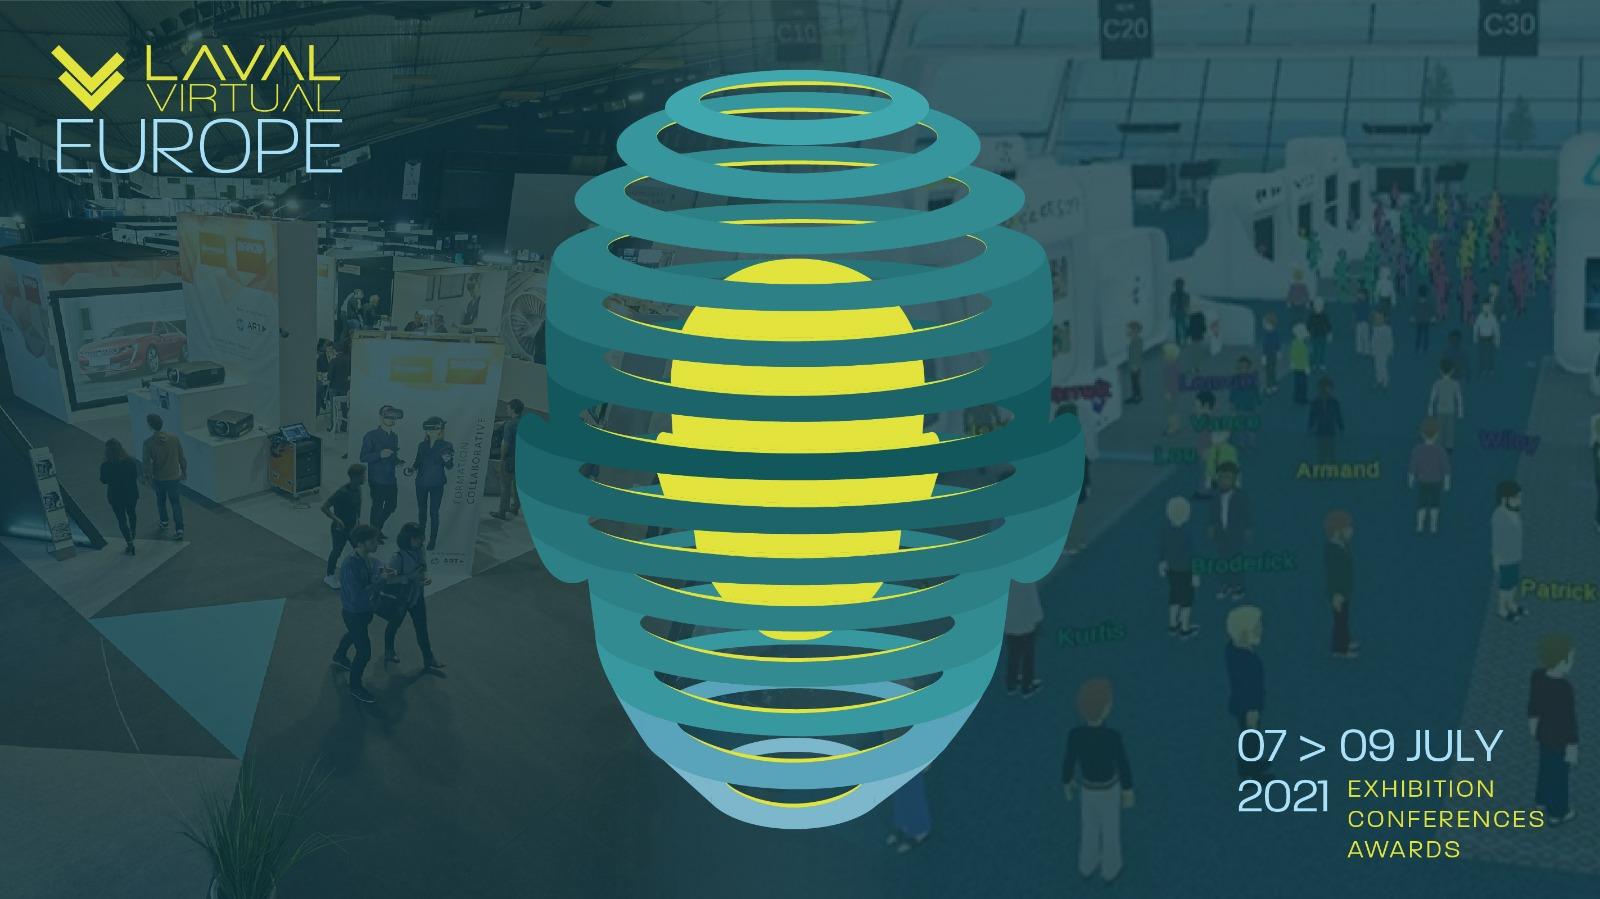 Laval Virtual 2021, hybrid event on July 7-9